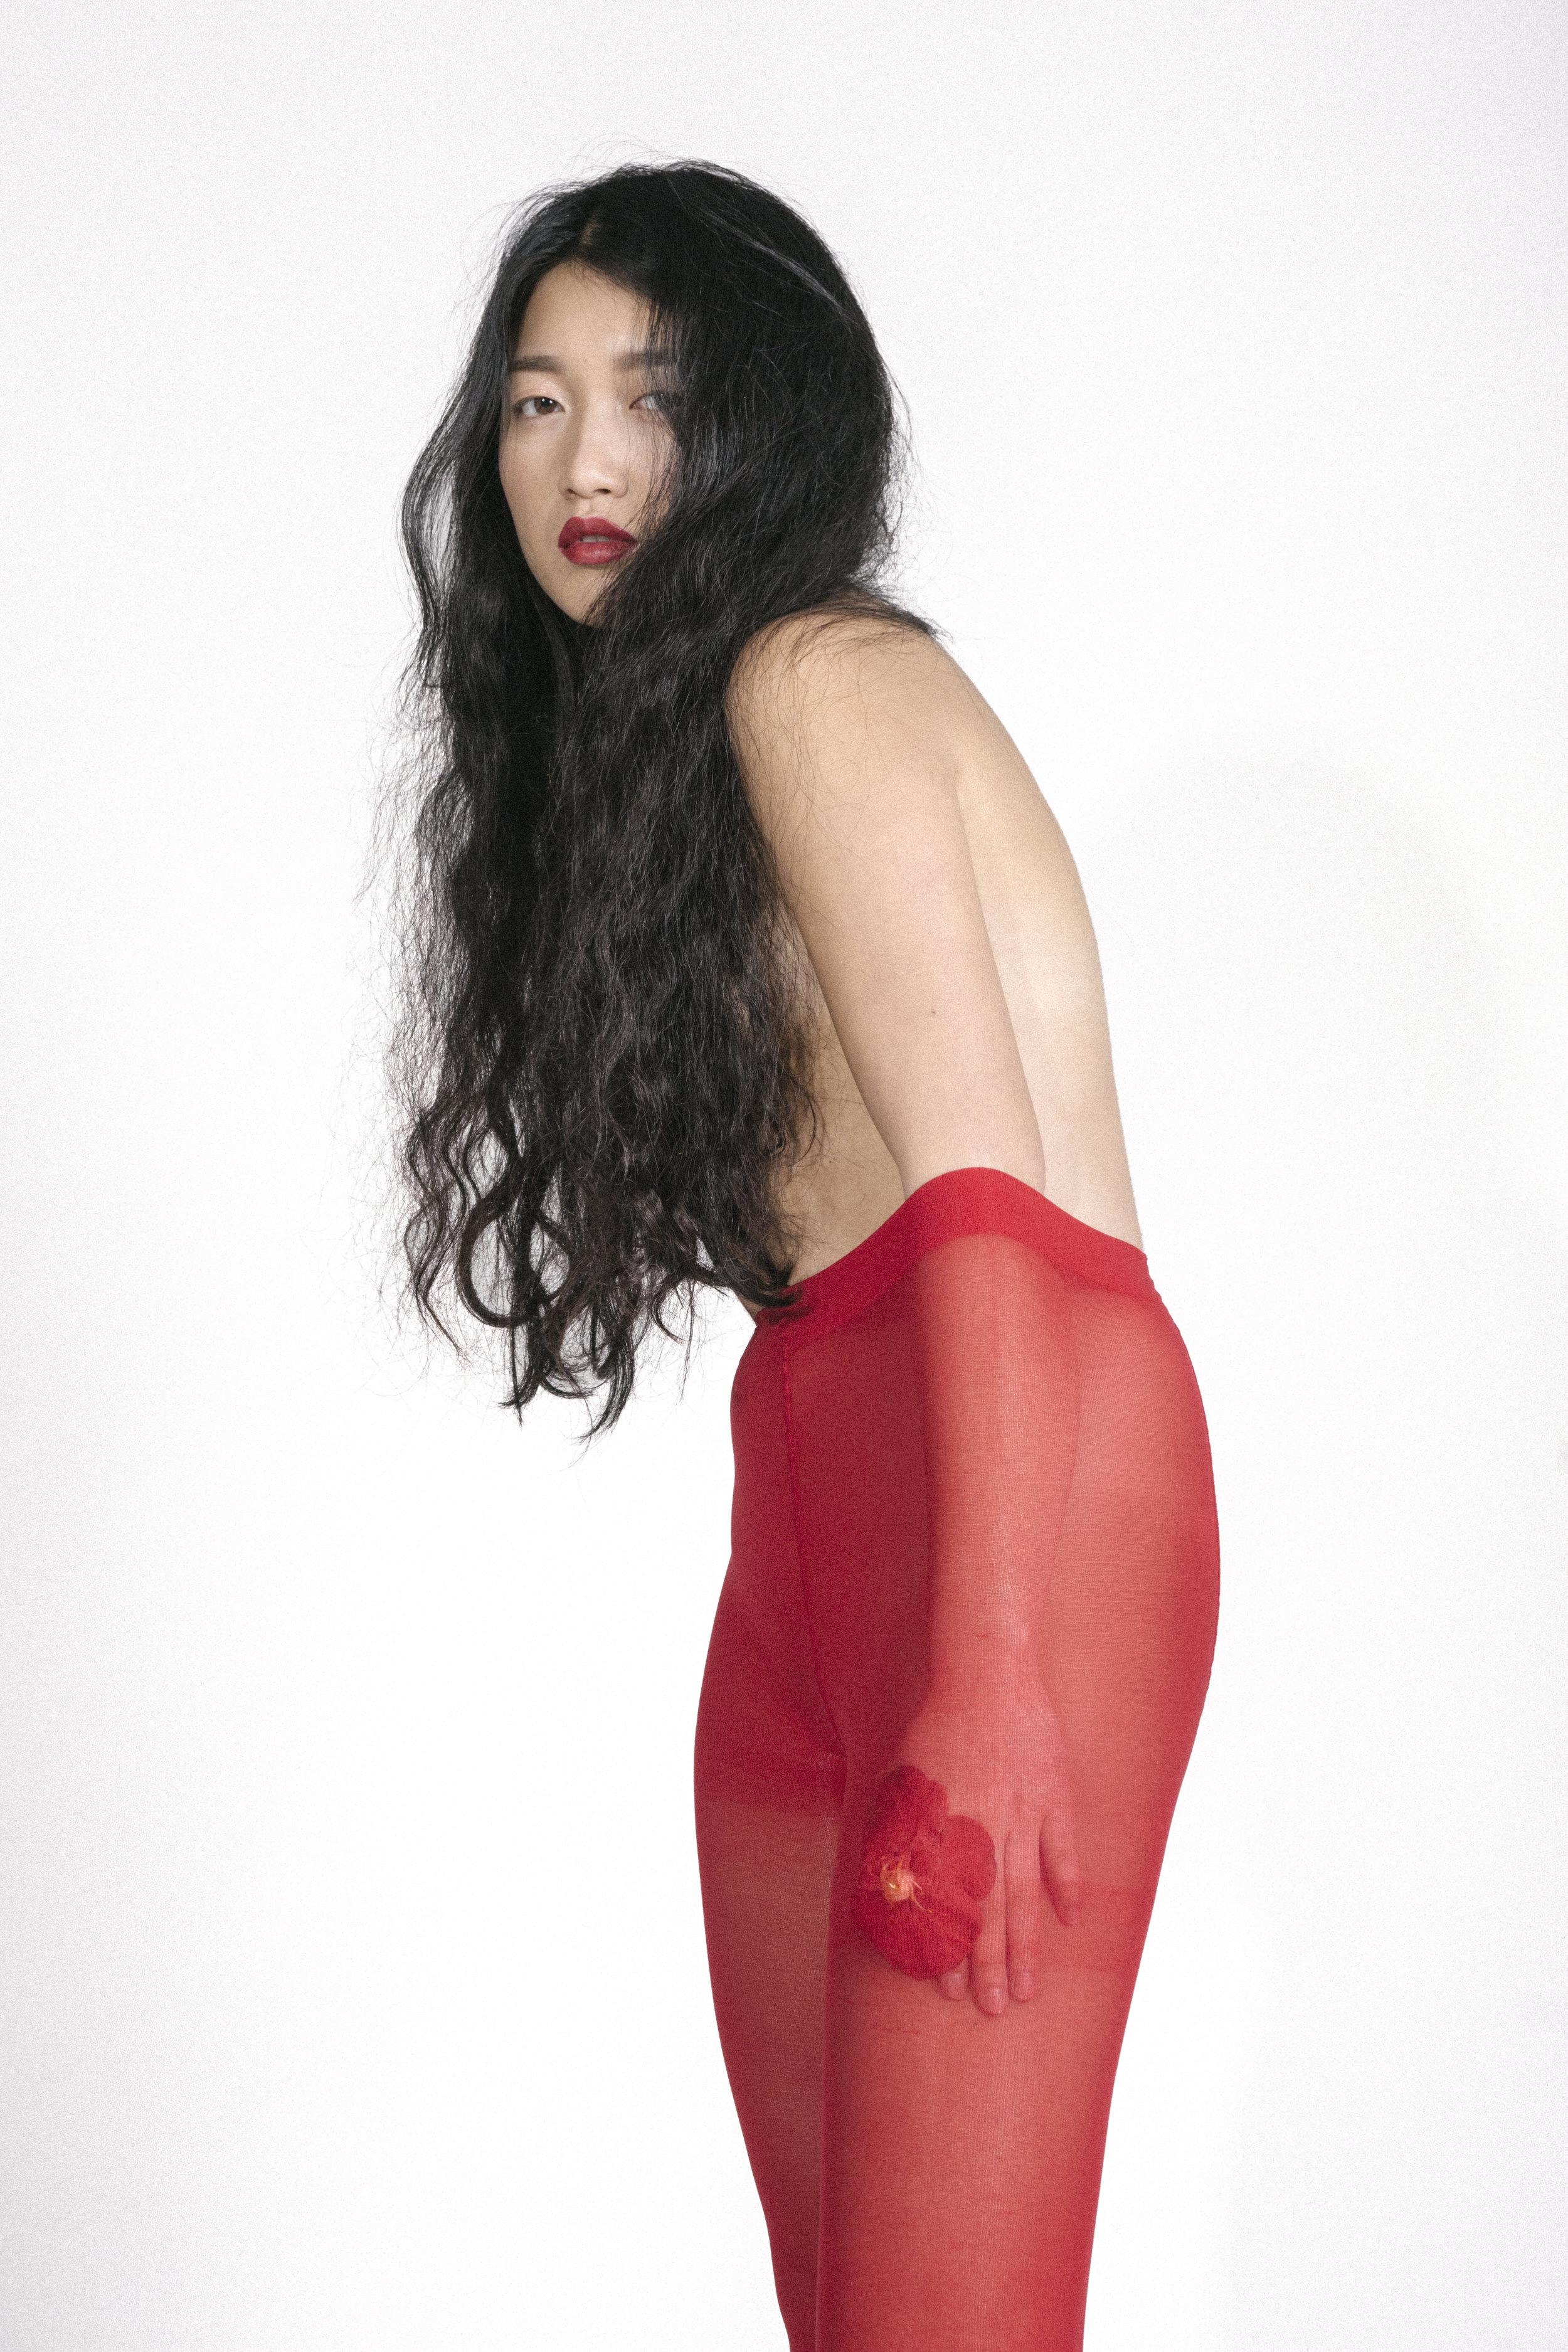 Photographer: Khiera Nicole Stylist: Mette Pors Hmua: Patricia Eleazar